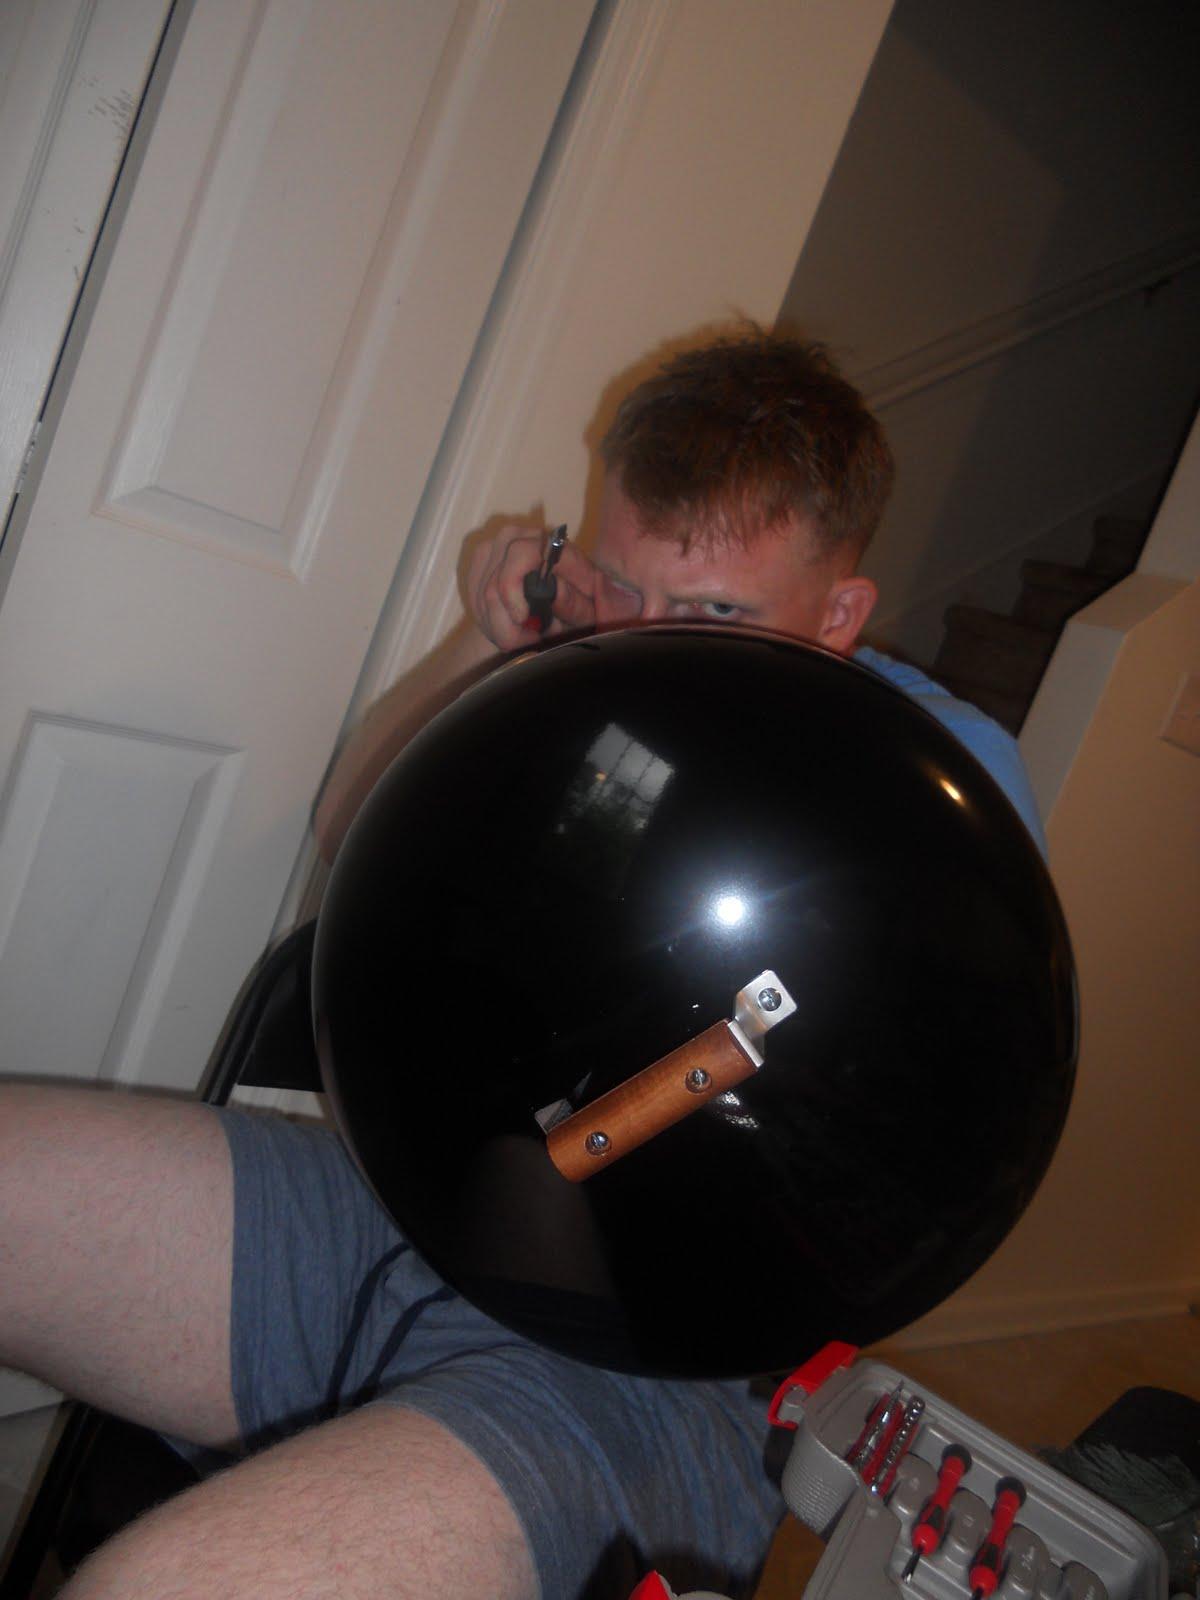 Mirepoix New Toy Brinkmann Smoke n Grill